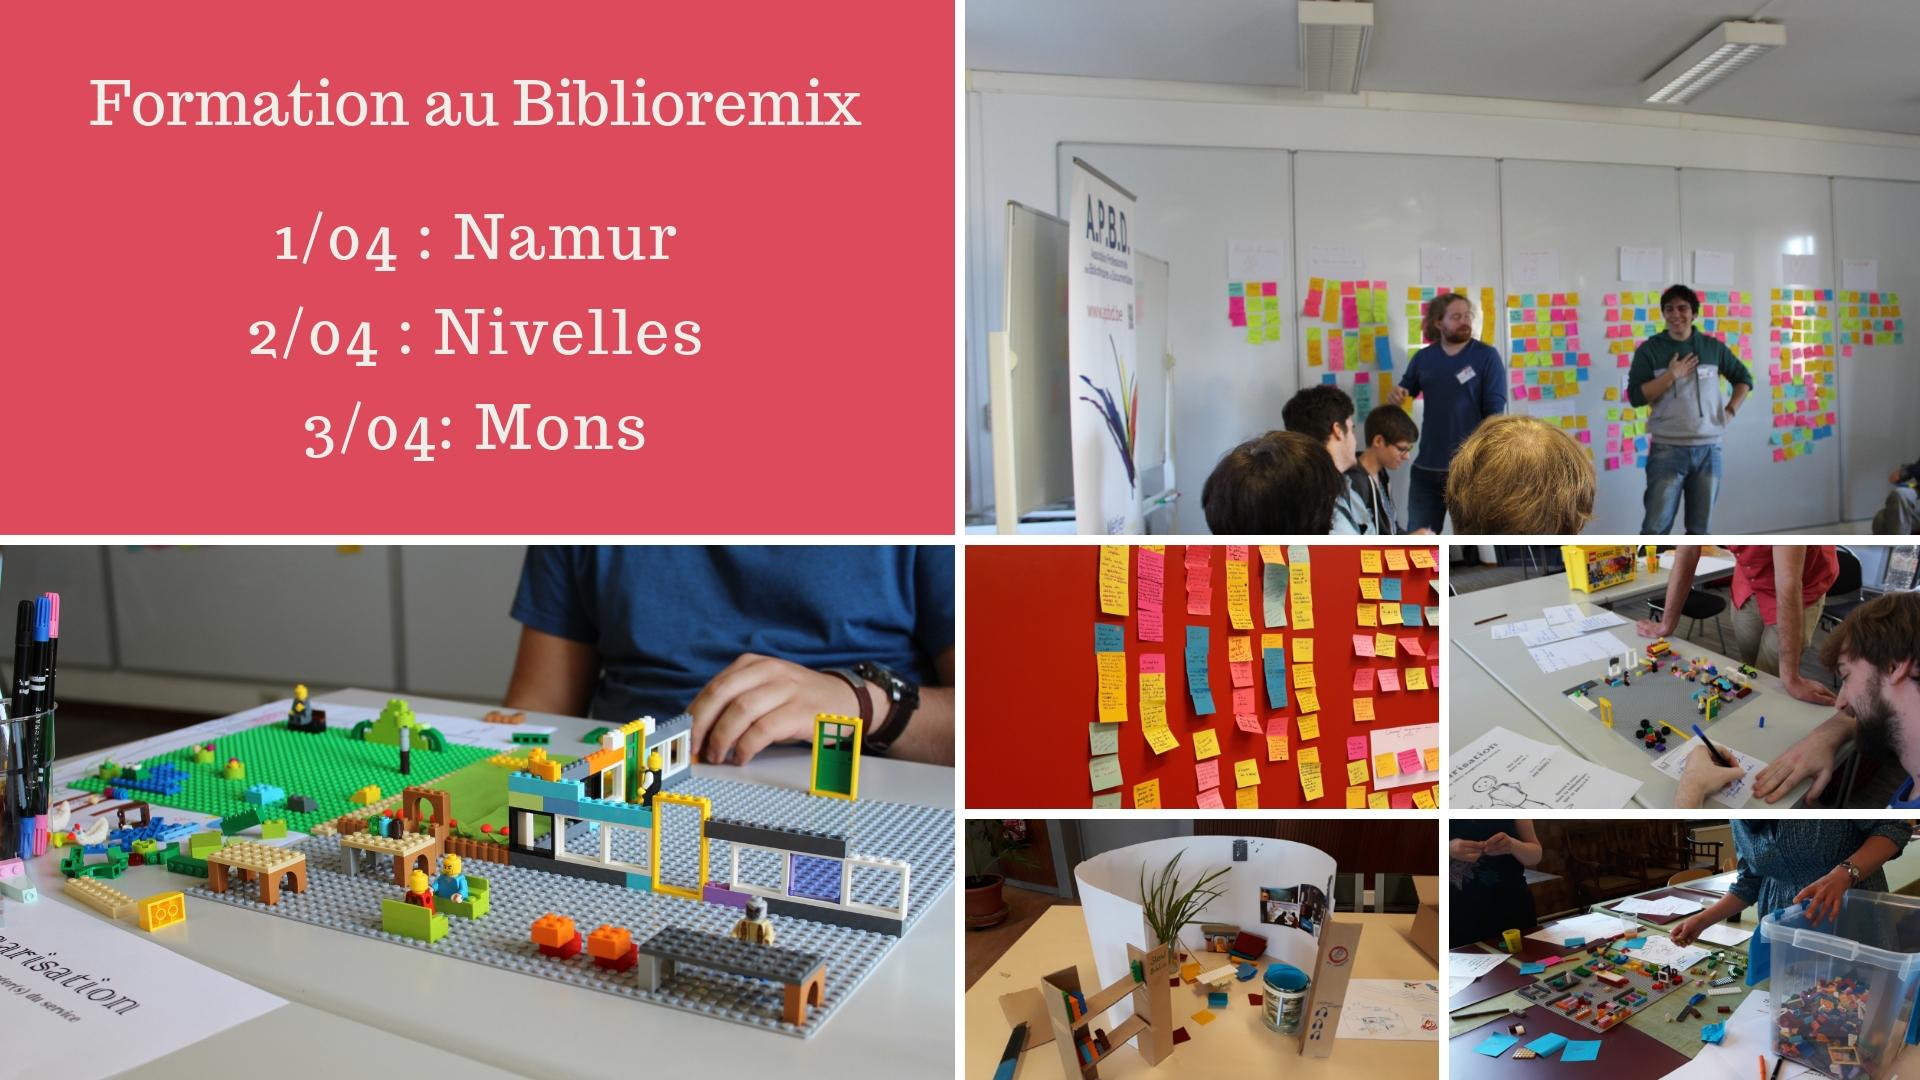 Formation-Biblioremix14-_01_-Namur15_01-_-Nivelles16_01_-Mons-1